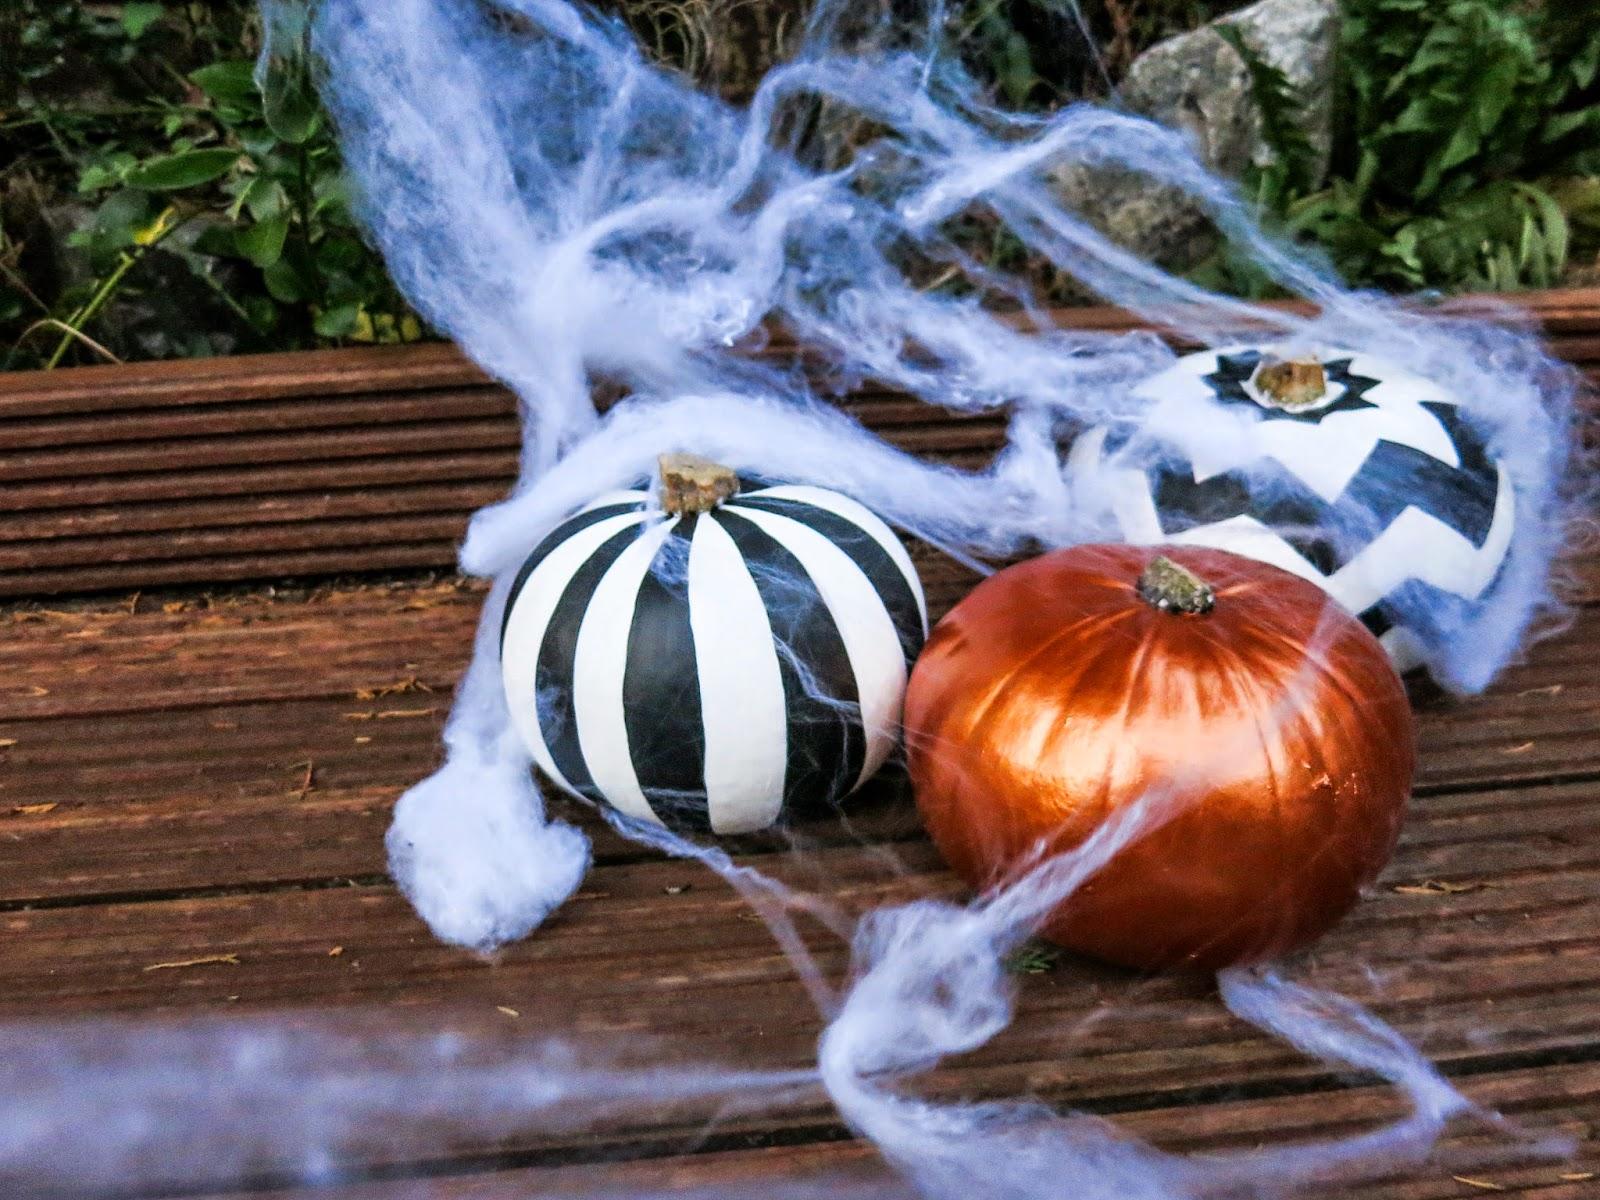 Halloween pumpkin painting craft DIY